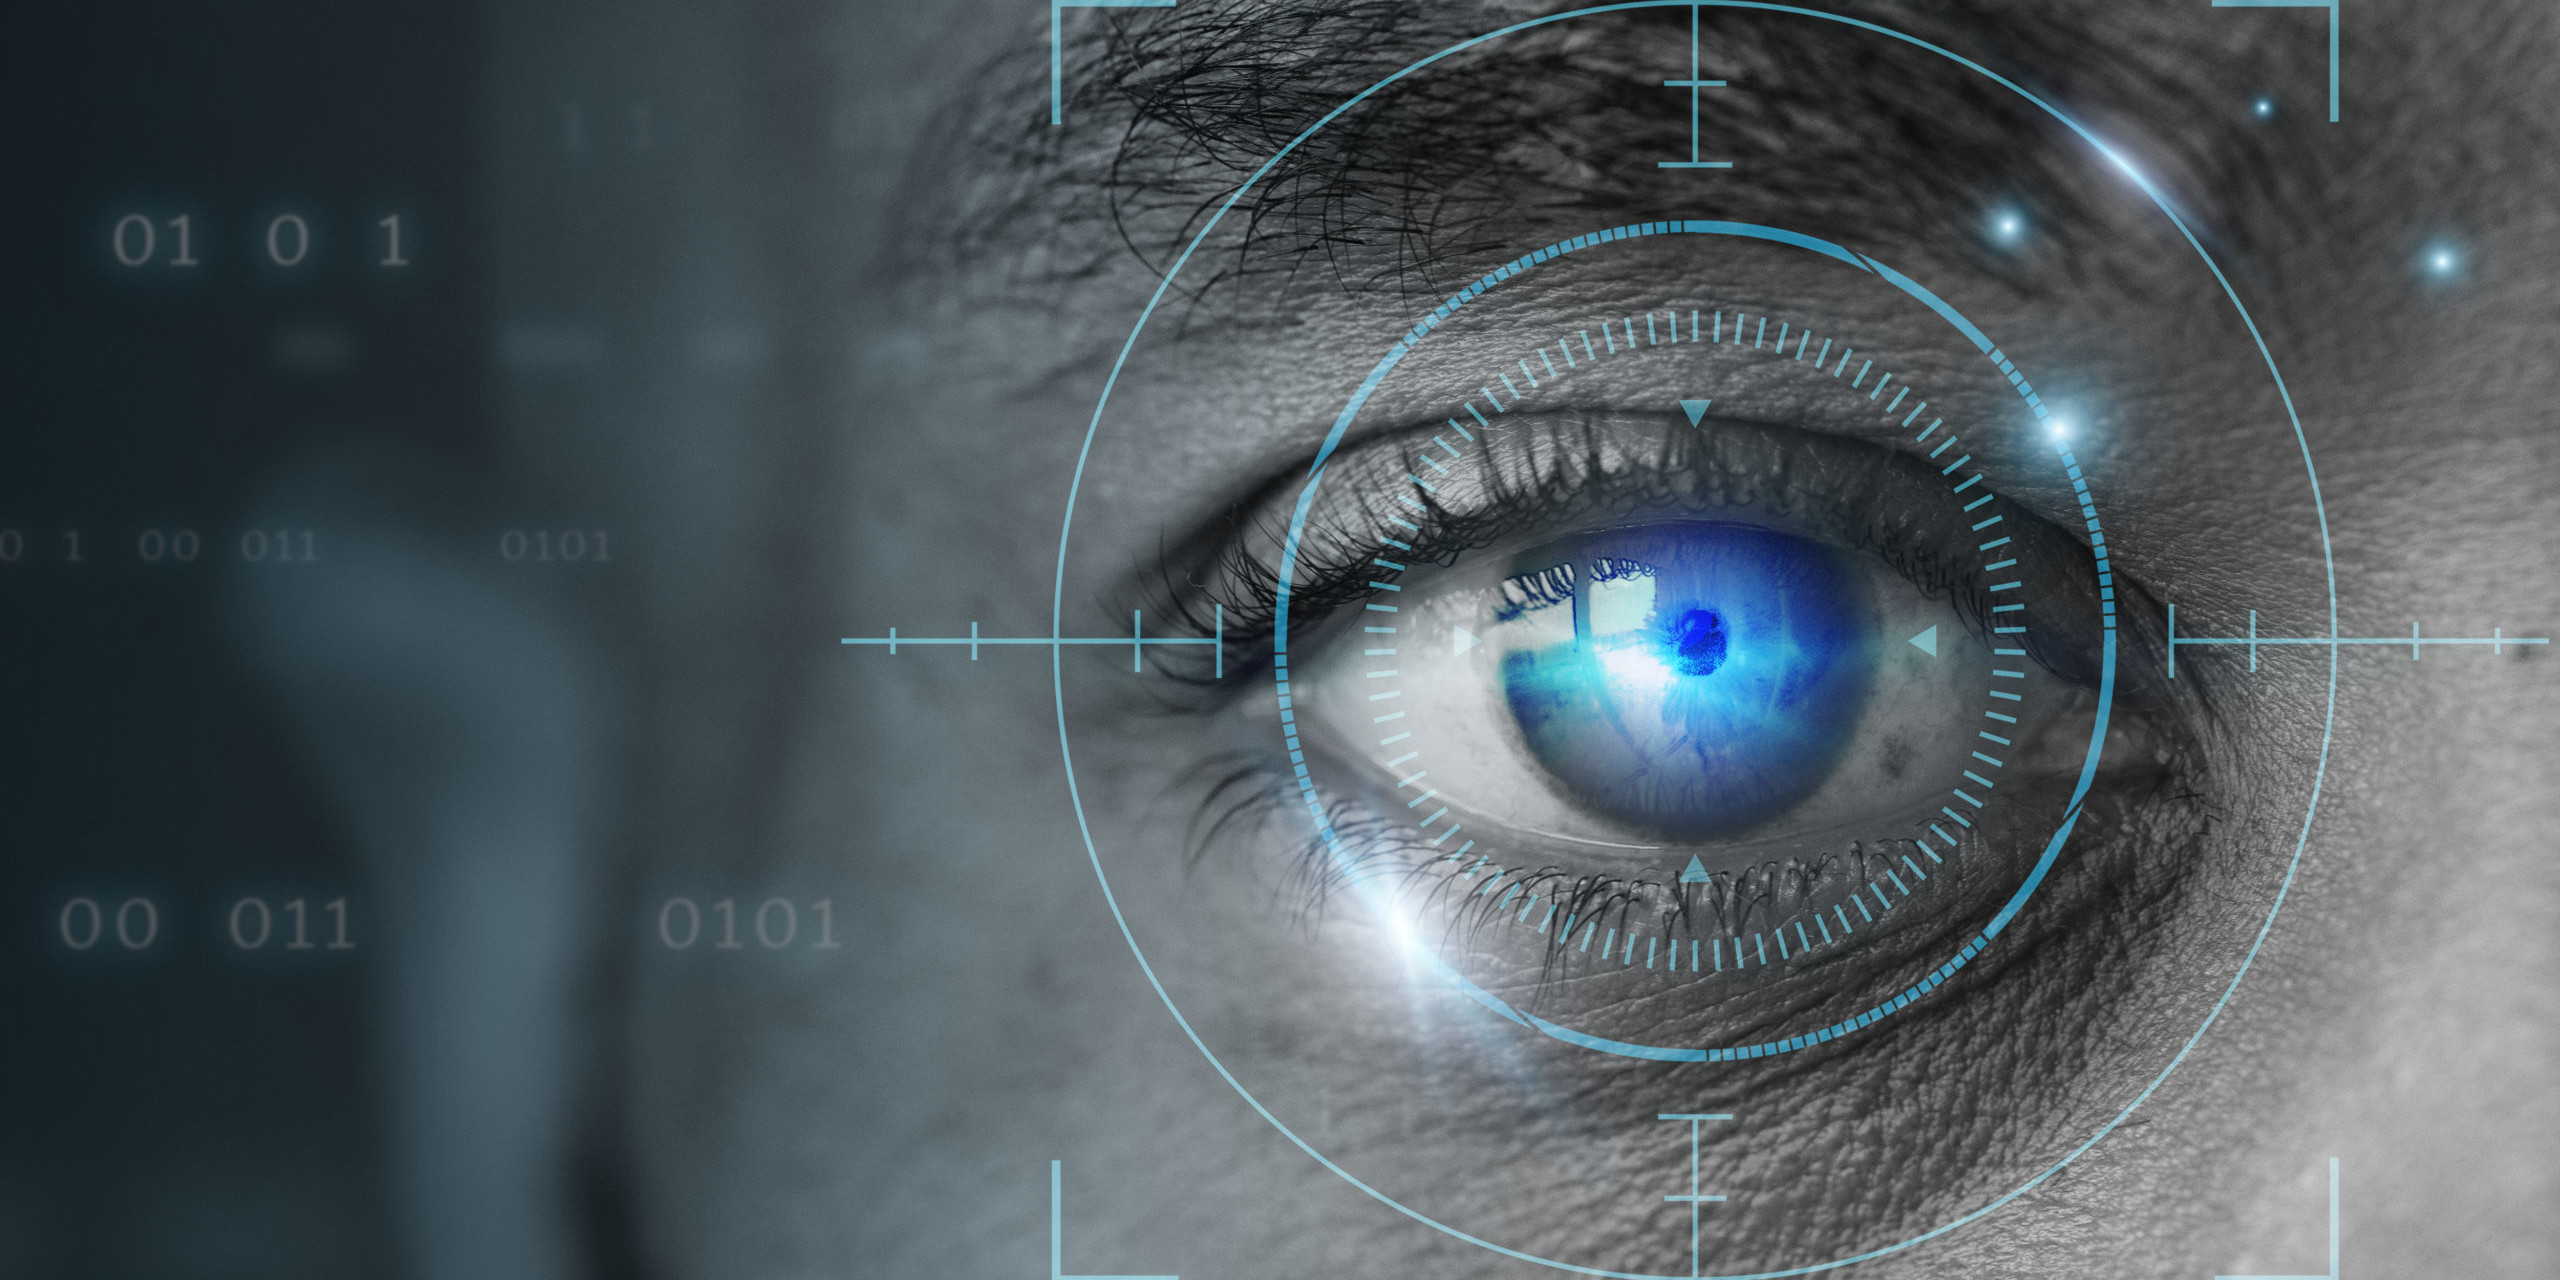 Applicazioni di intelligenza artificiale